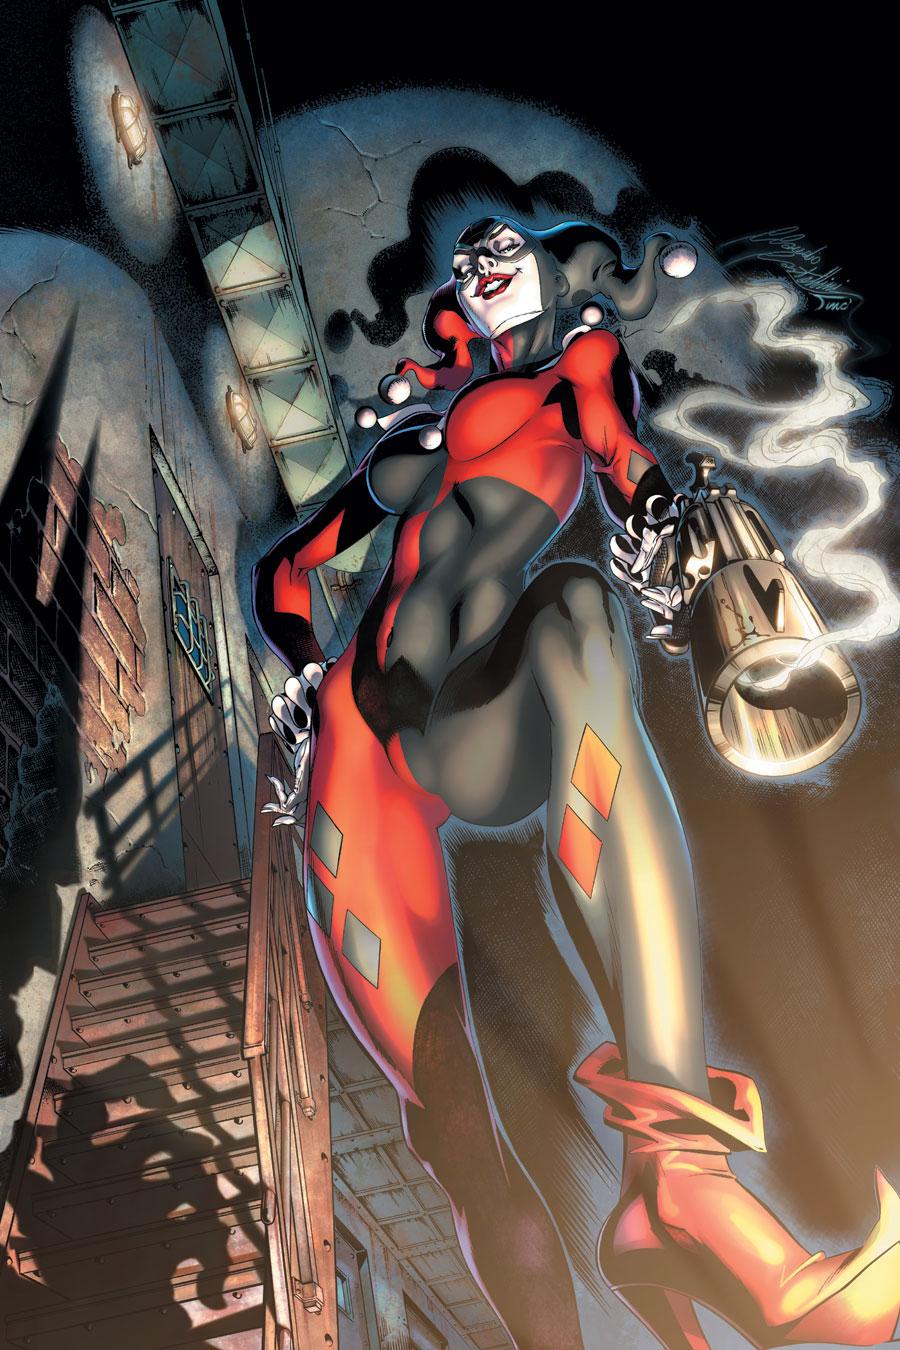 Joker's Asylum: Harley Quinn Vol 1 1